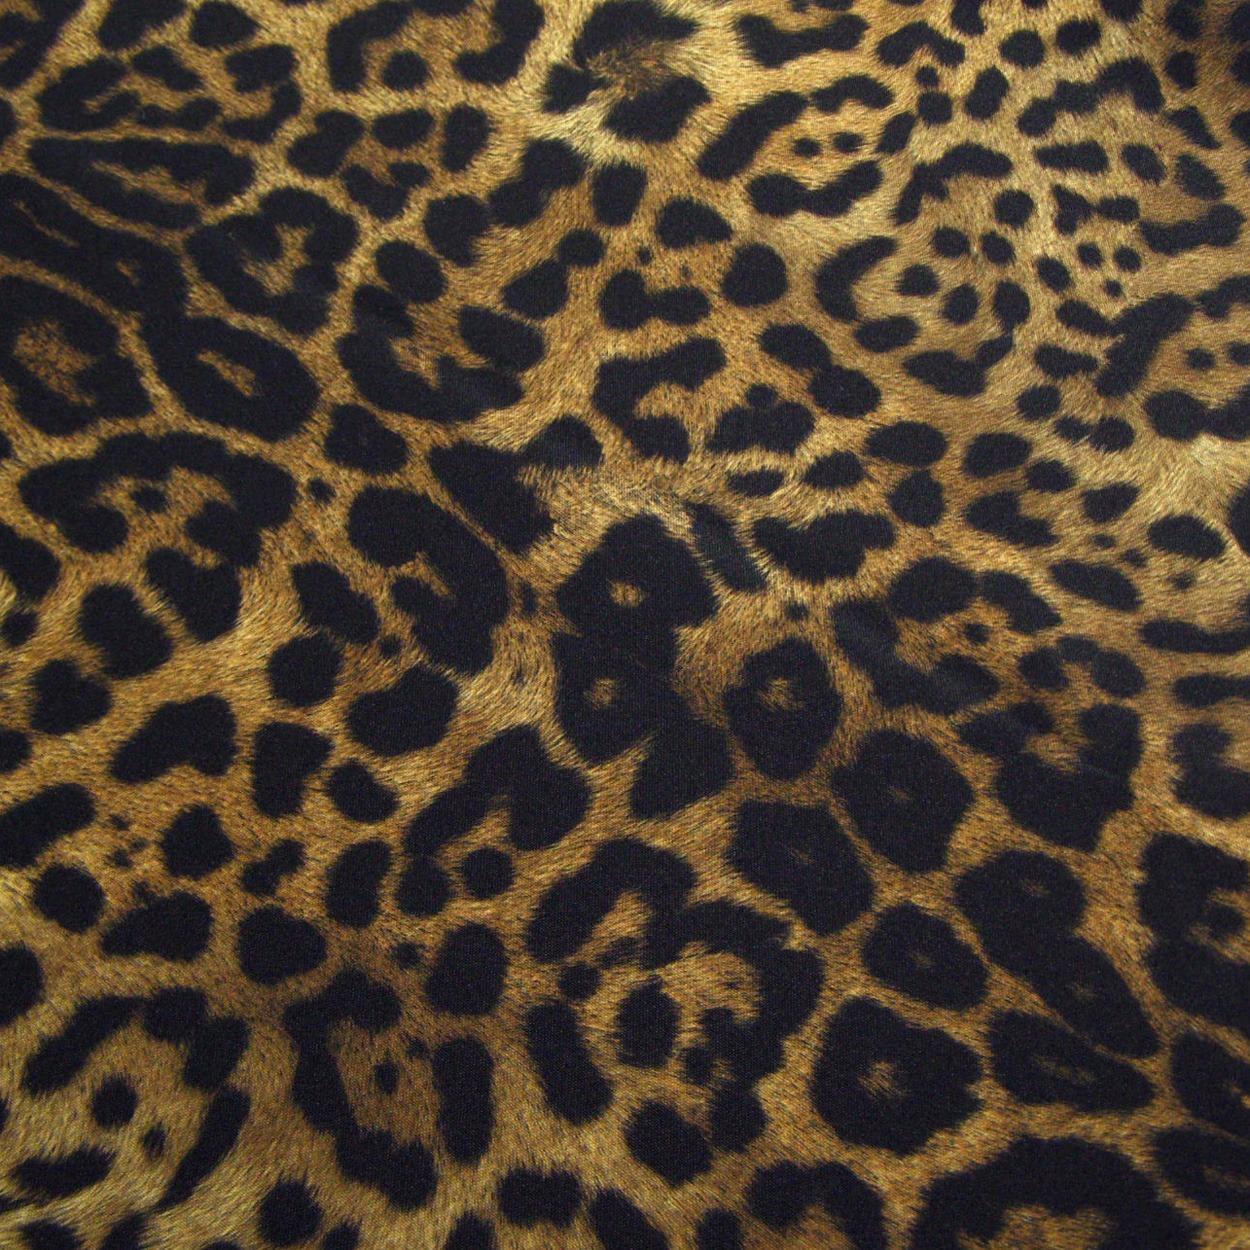 Jaguar Animal Print